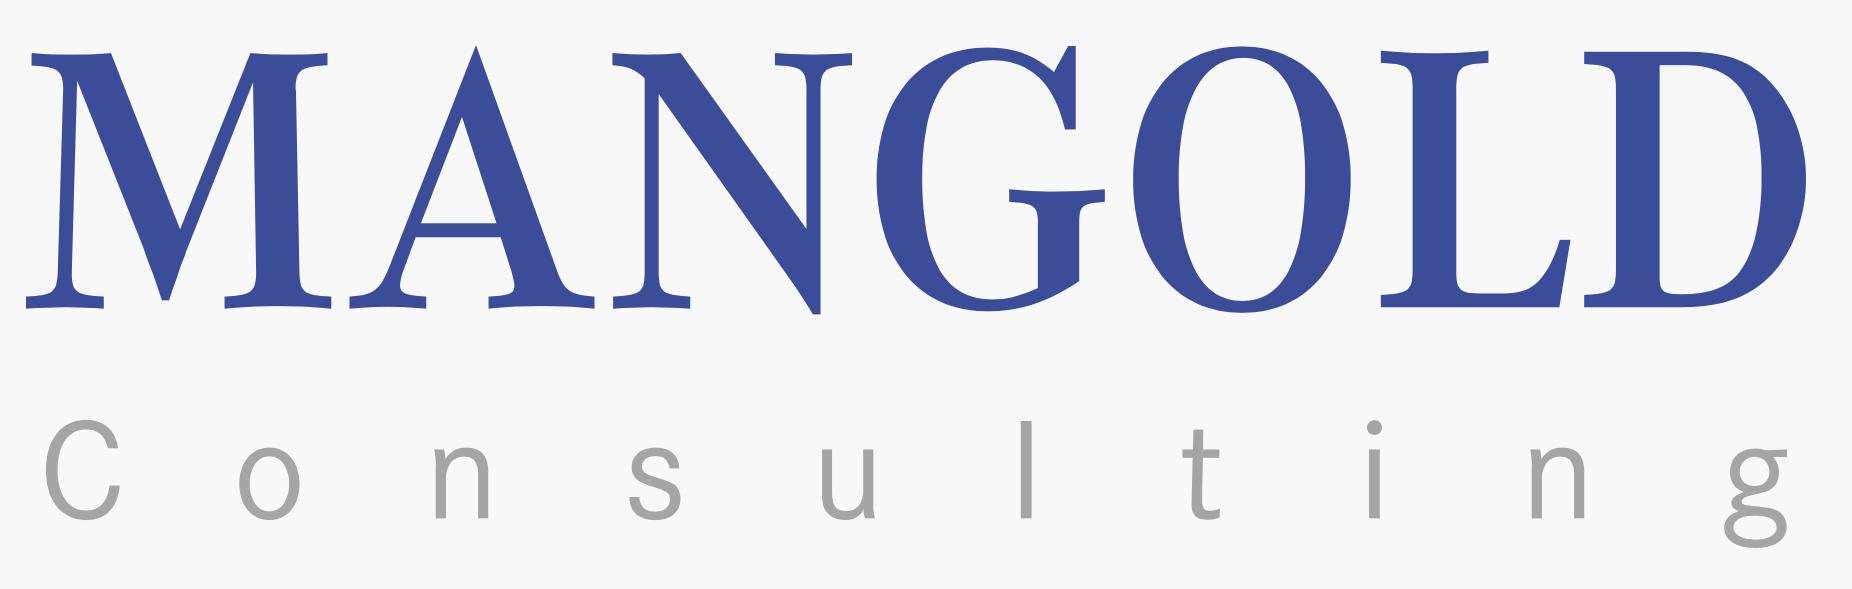 Prof. Dr. Klaus Mangold - Mangold Consulting GmbH